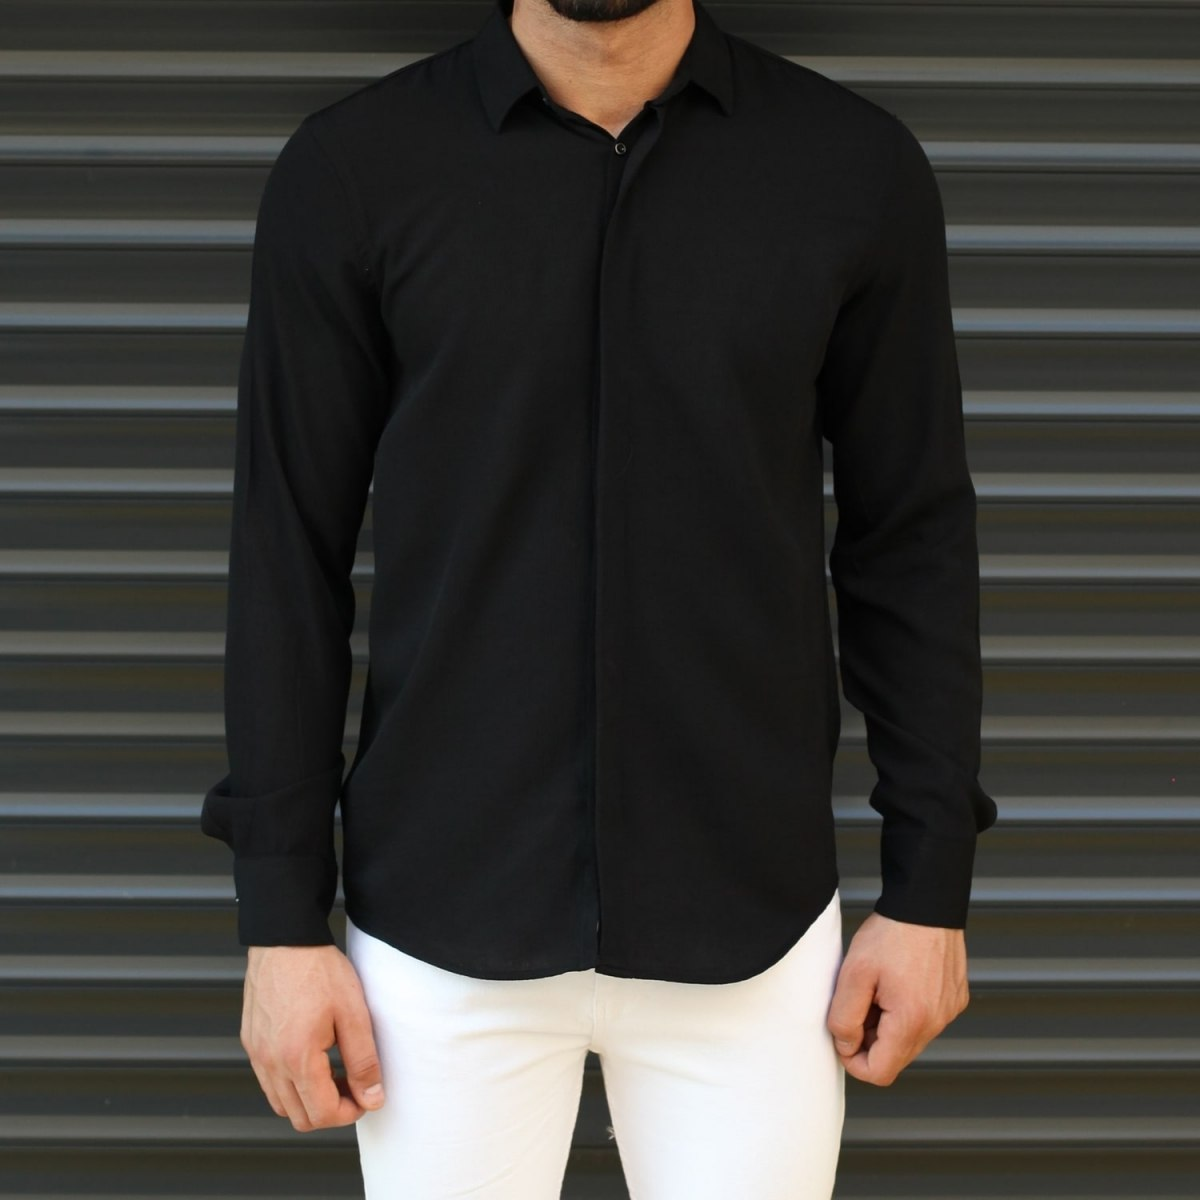 Men's Basic Stylish Casual Shirt In Solid Black Mv Premium Brand - 1